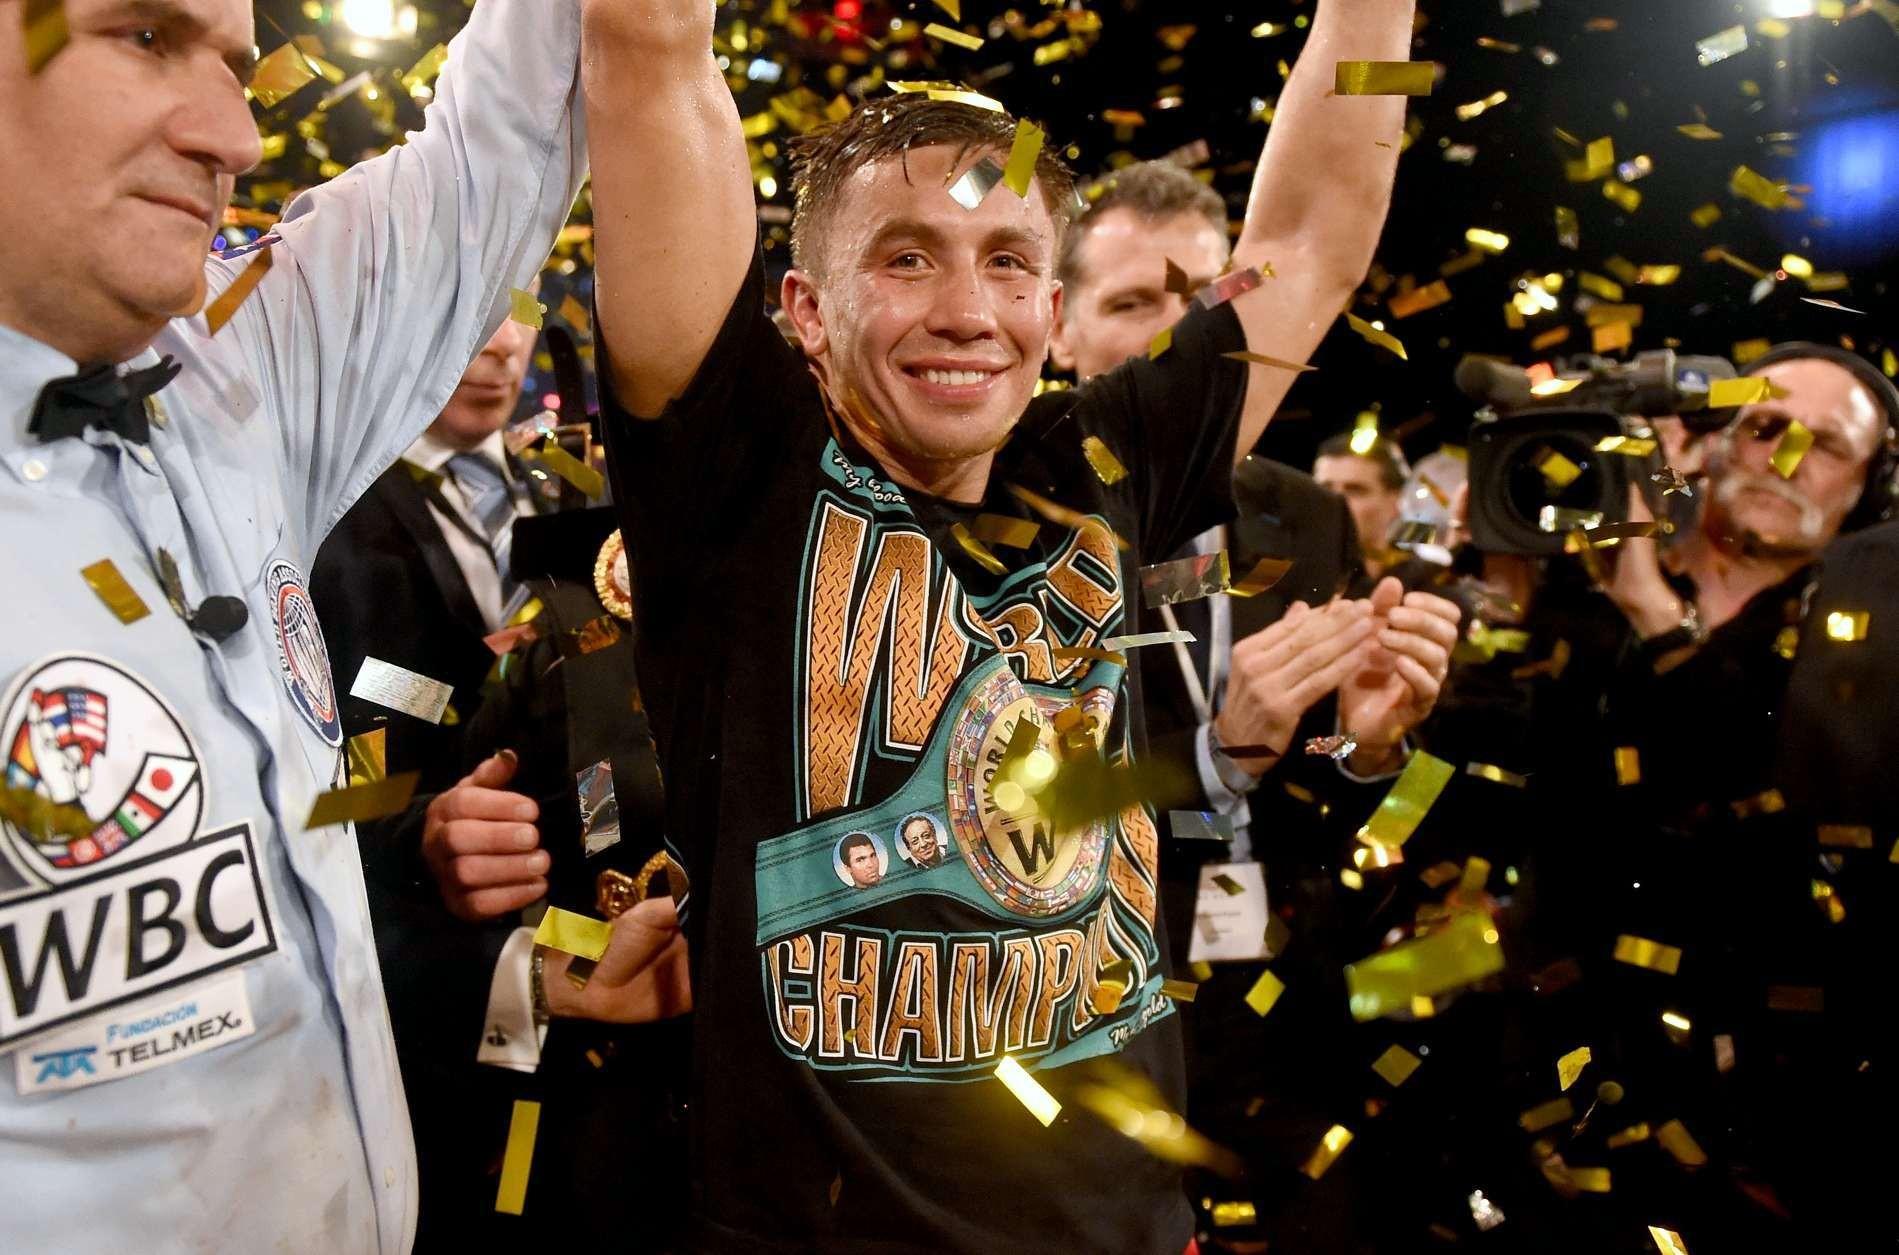 cb3f89e6 Home / WBC / WBC Branded Clothing / World Boxing Council Championship belt  ...